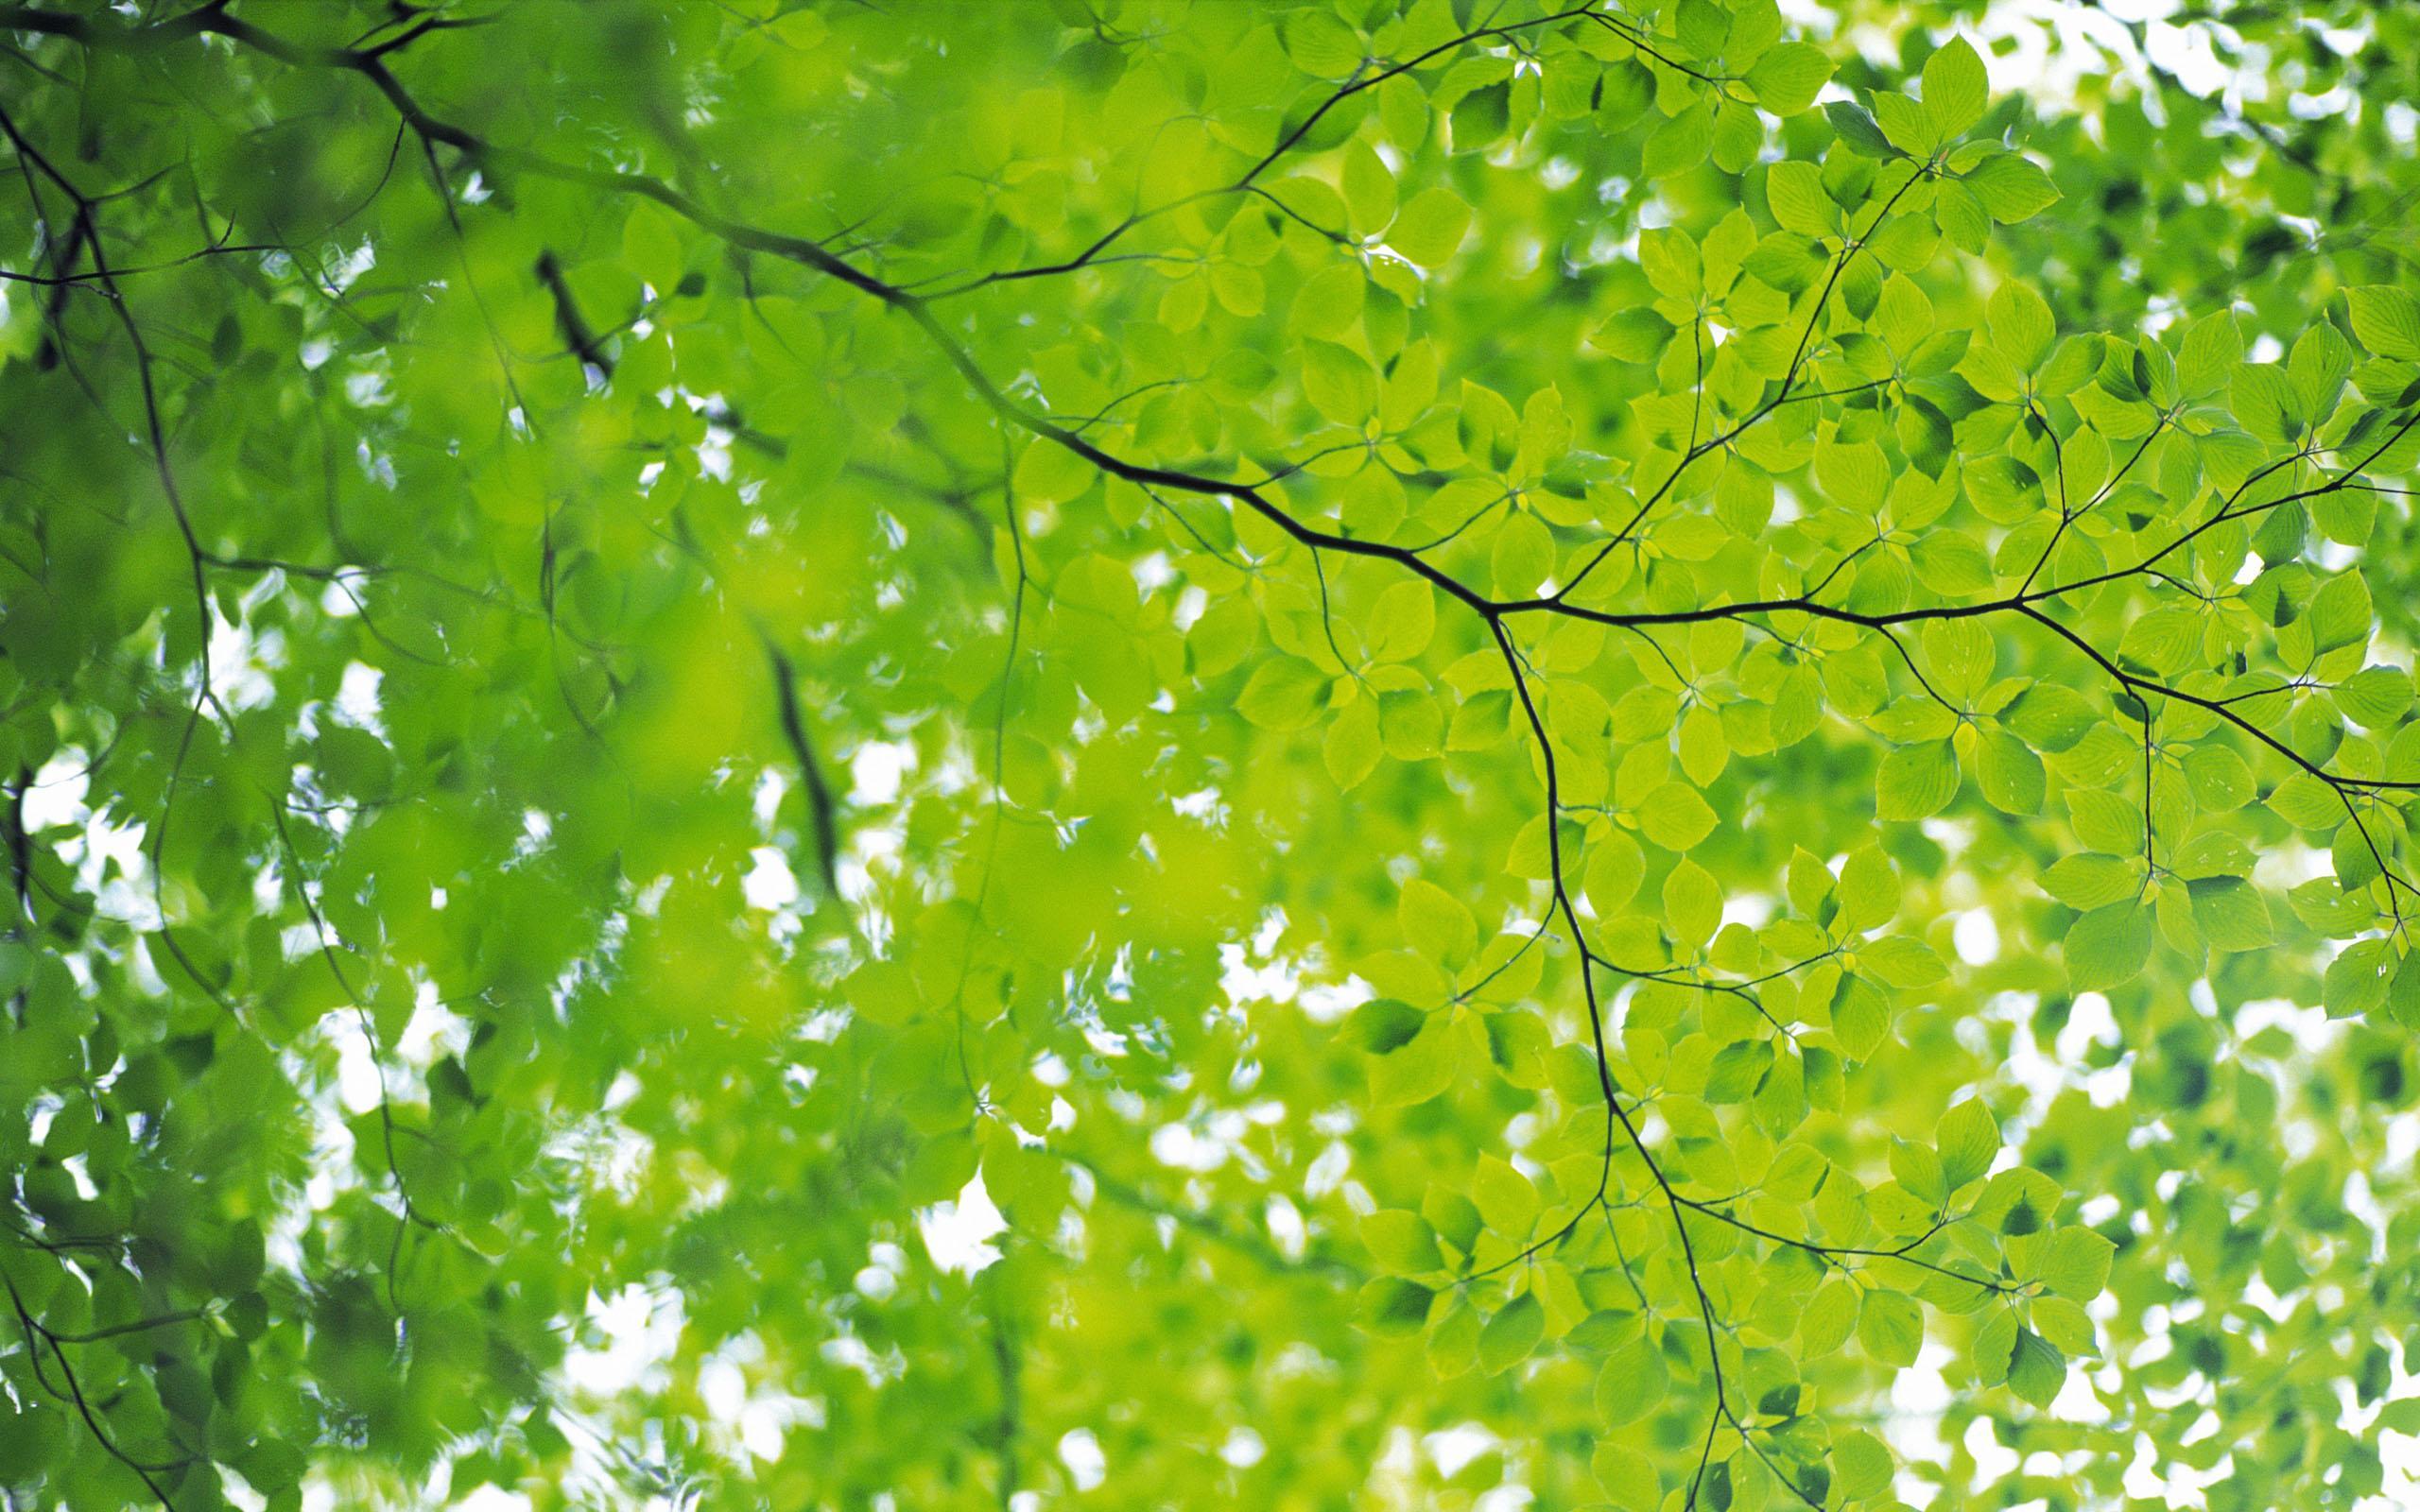 Free Download Green Nature Wallpaper Hd Wallpaper 1017619 2560x1600 For Your Desktop Mobile Tablet Explore 49 Green Nature Wallpaper Green Flower Wallpaper Green Nature Wallpaper Desktop Green Wallpaper Designs Nature